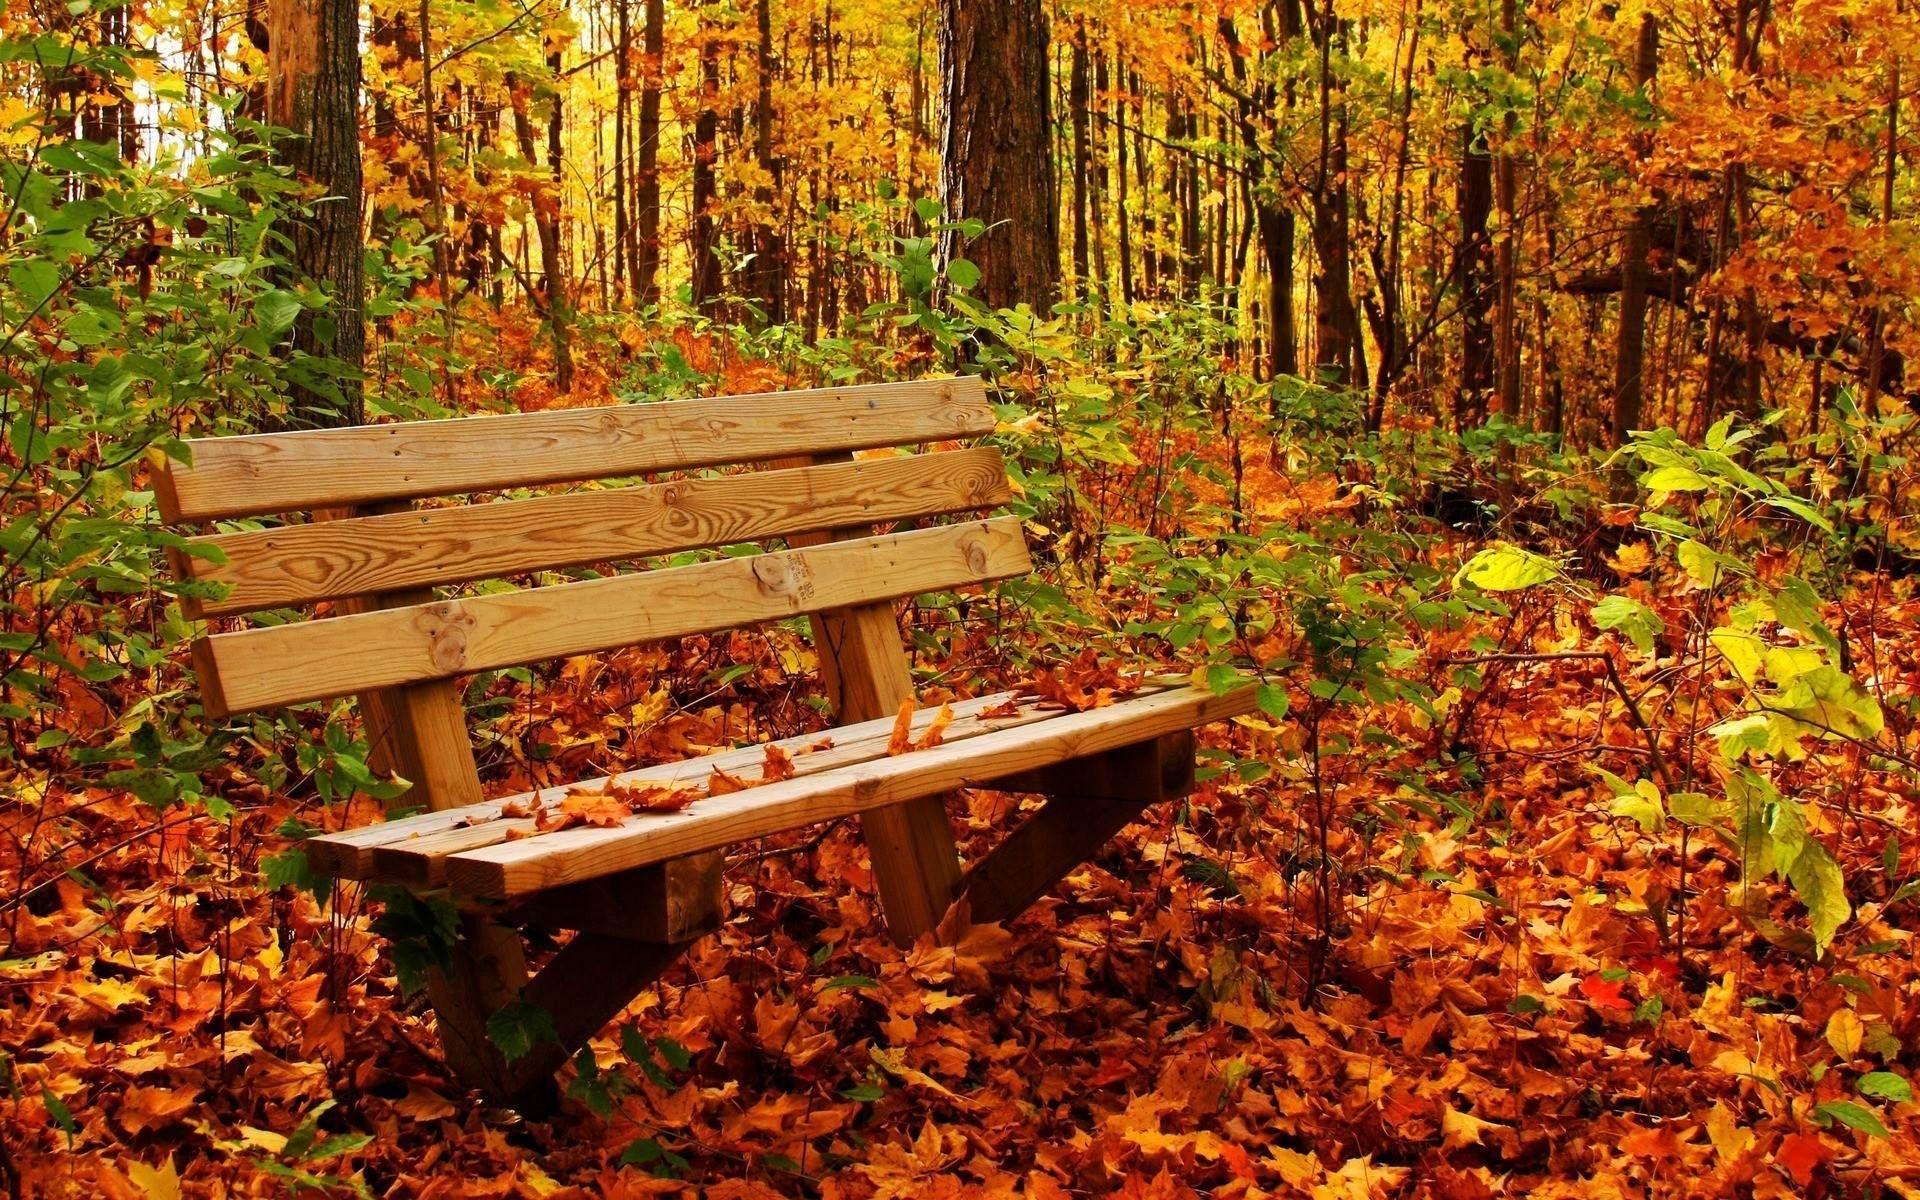 autumn season 907149 widescreen desktop mobile iphone android hd wallpaper and desktop